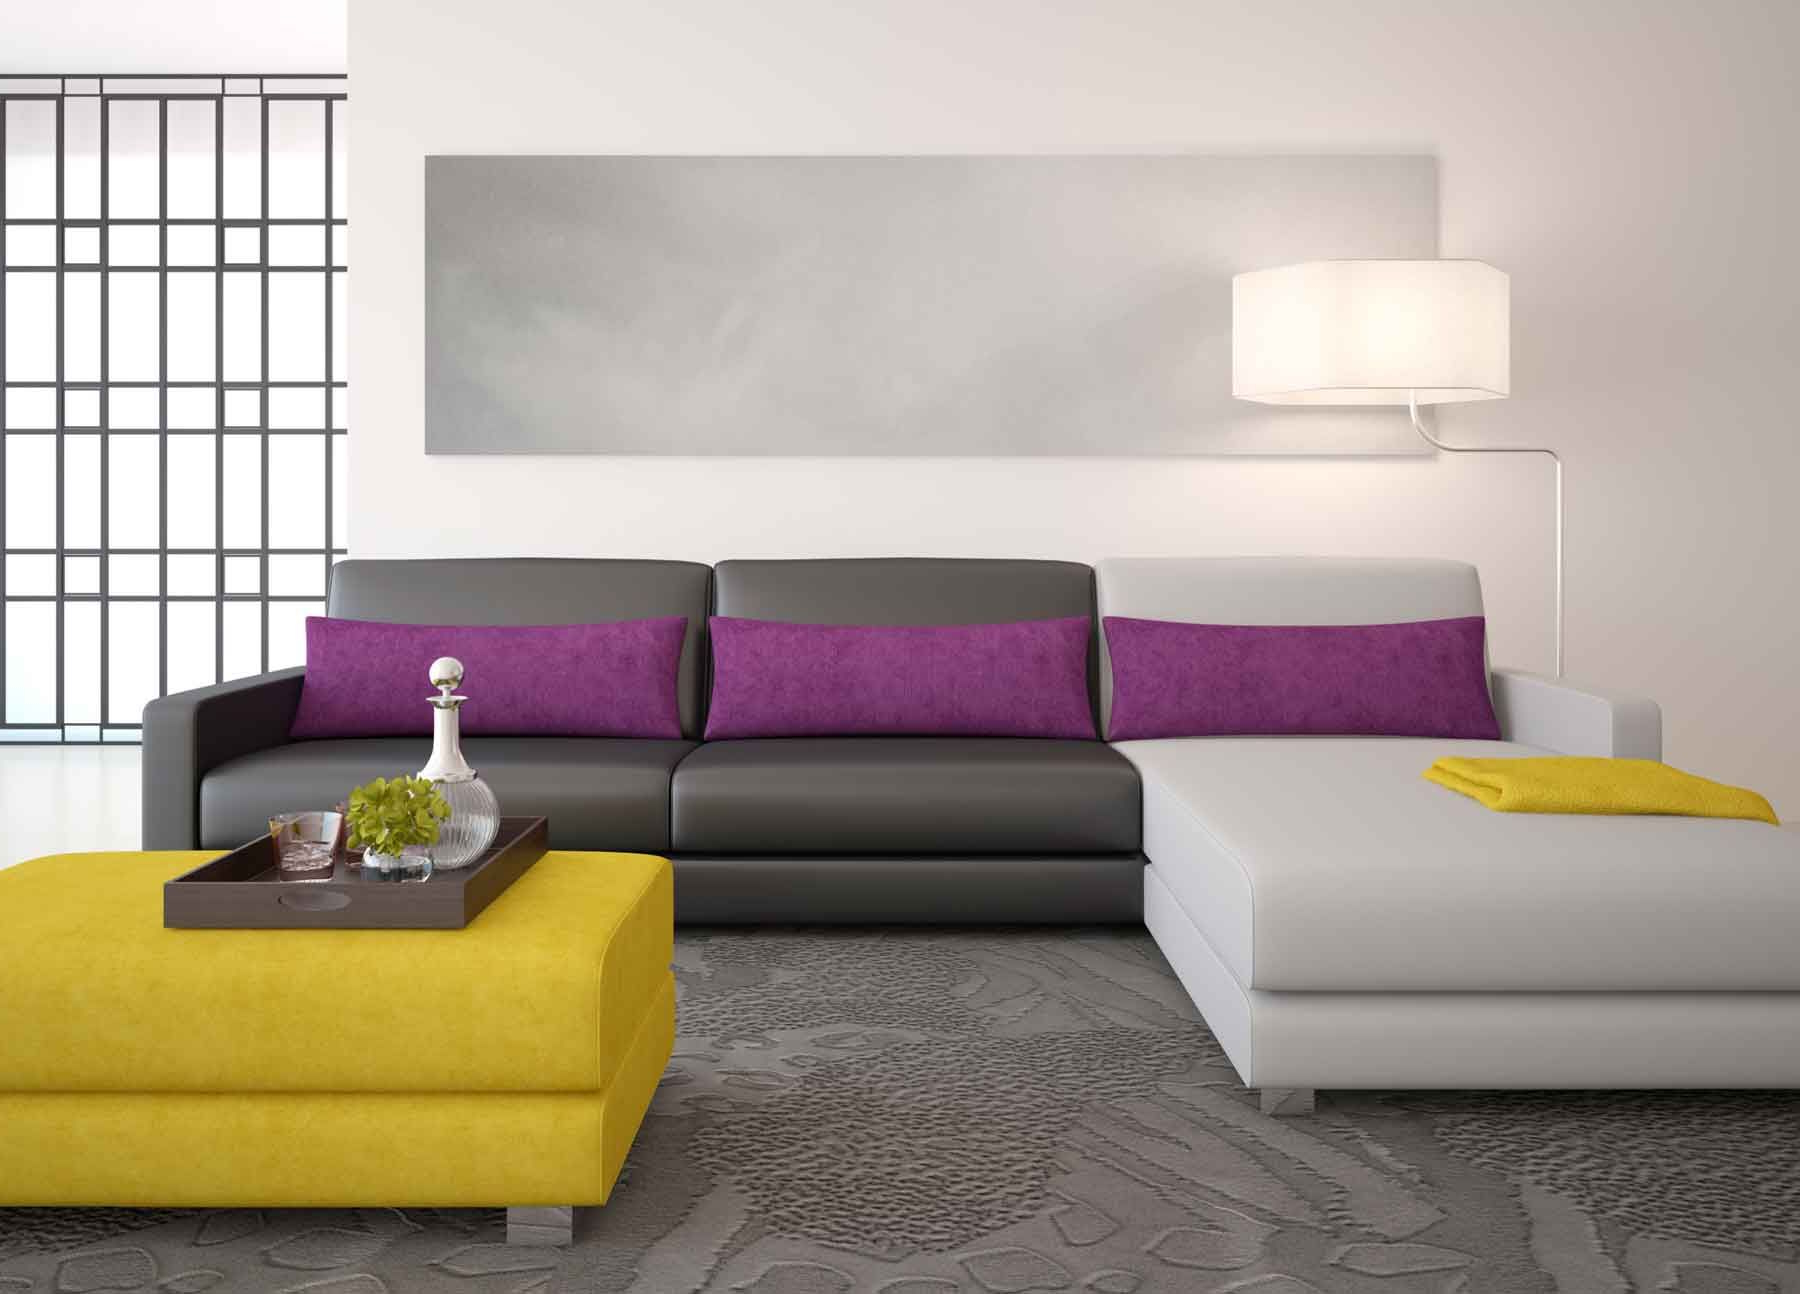 Sofa Gris Como Pintar Las Paredes Fmdf sofà De Color Gris Para El Salà N Hogarmania